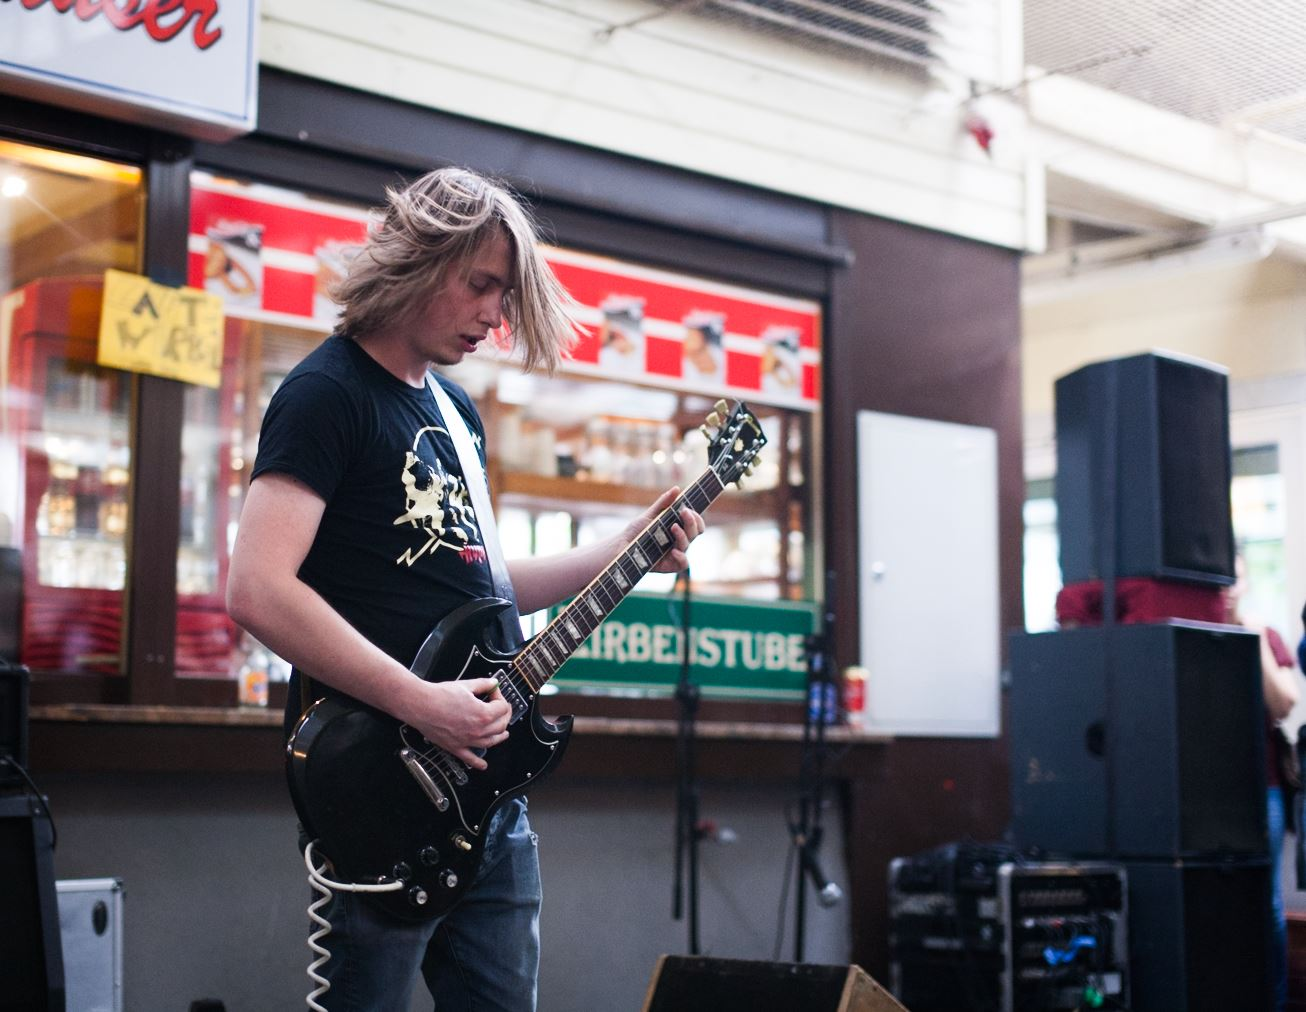 Straßenmusiker mit Gitarre © Darius Kromoser